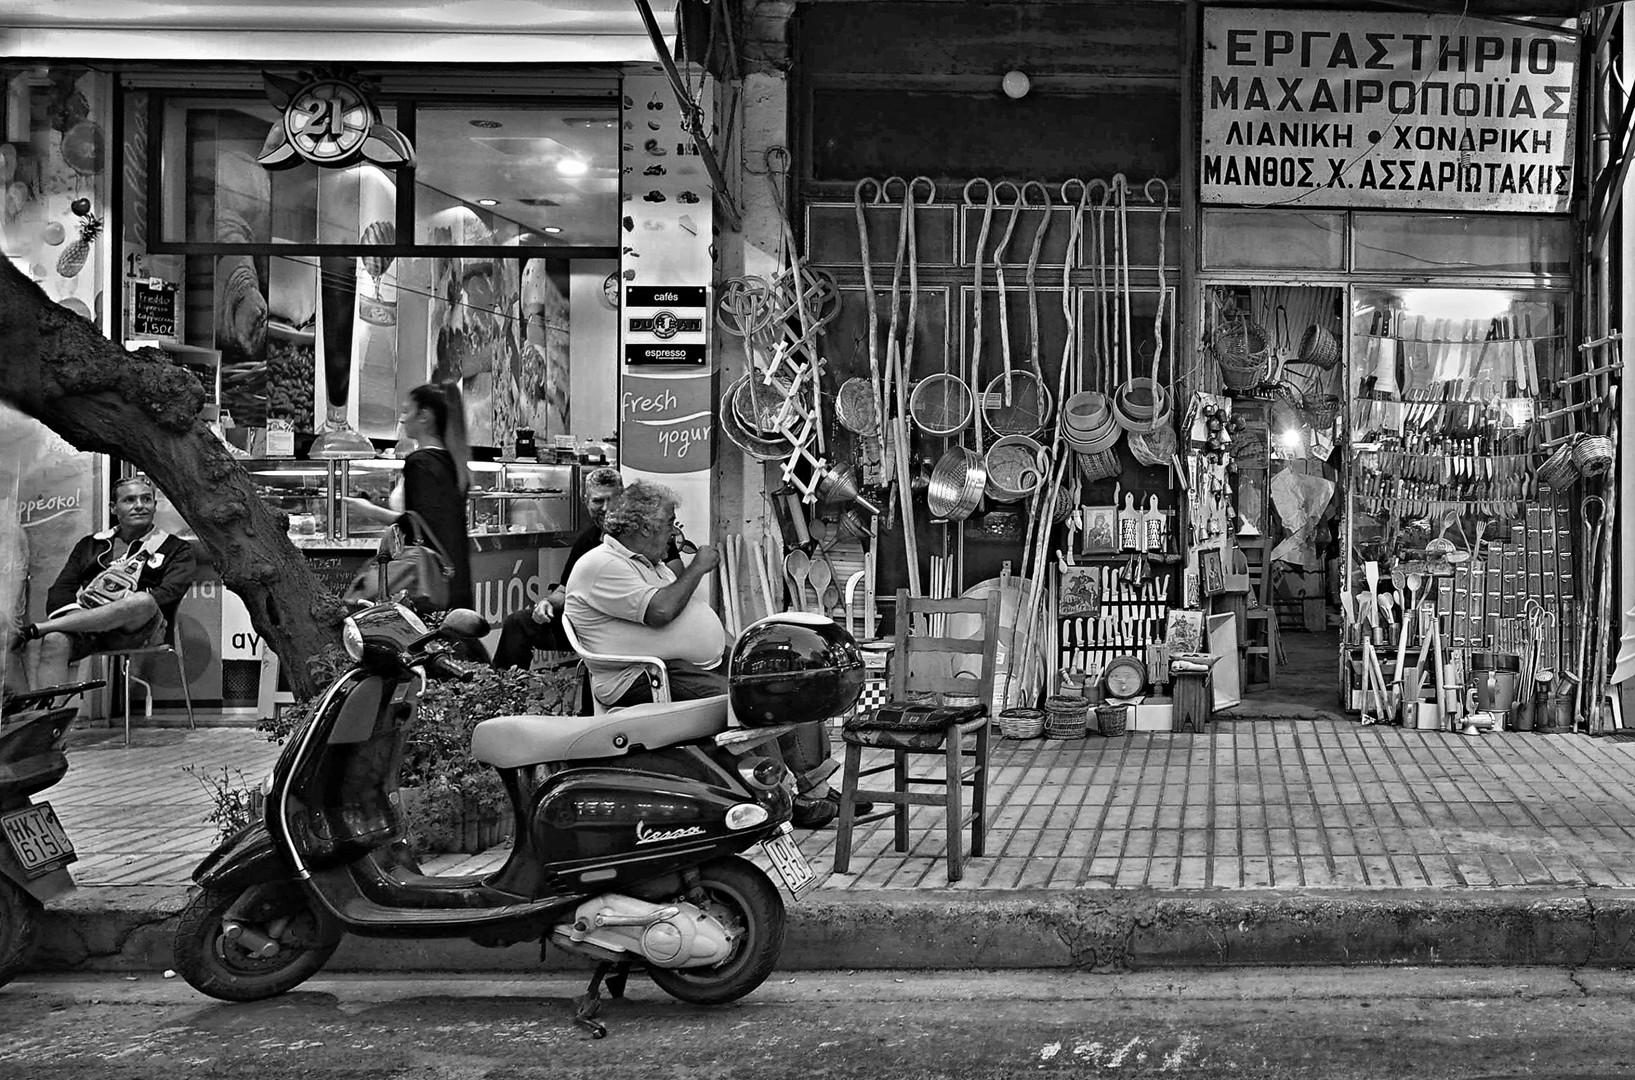 Krit street